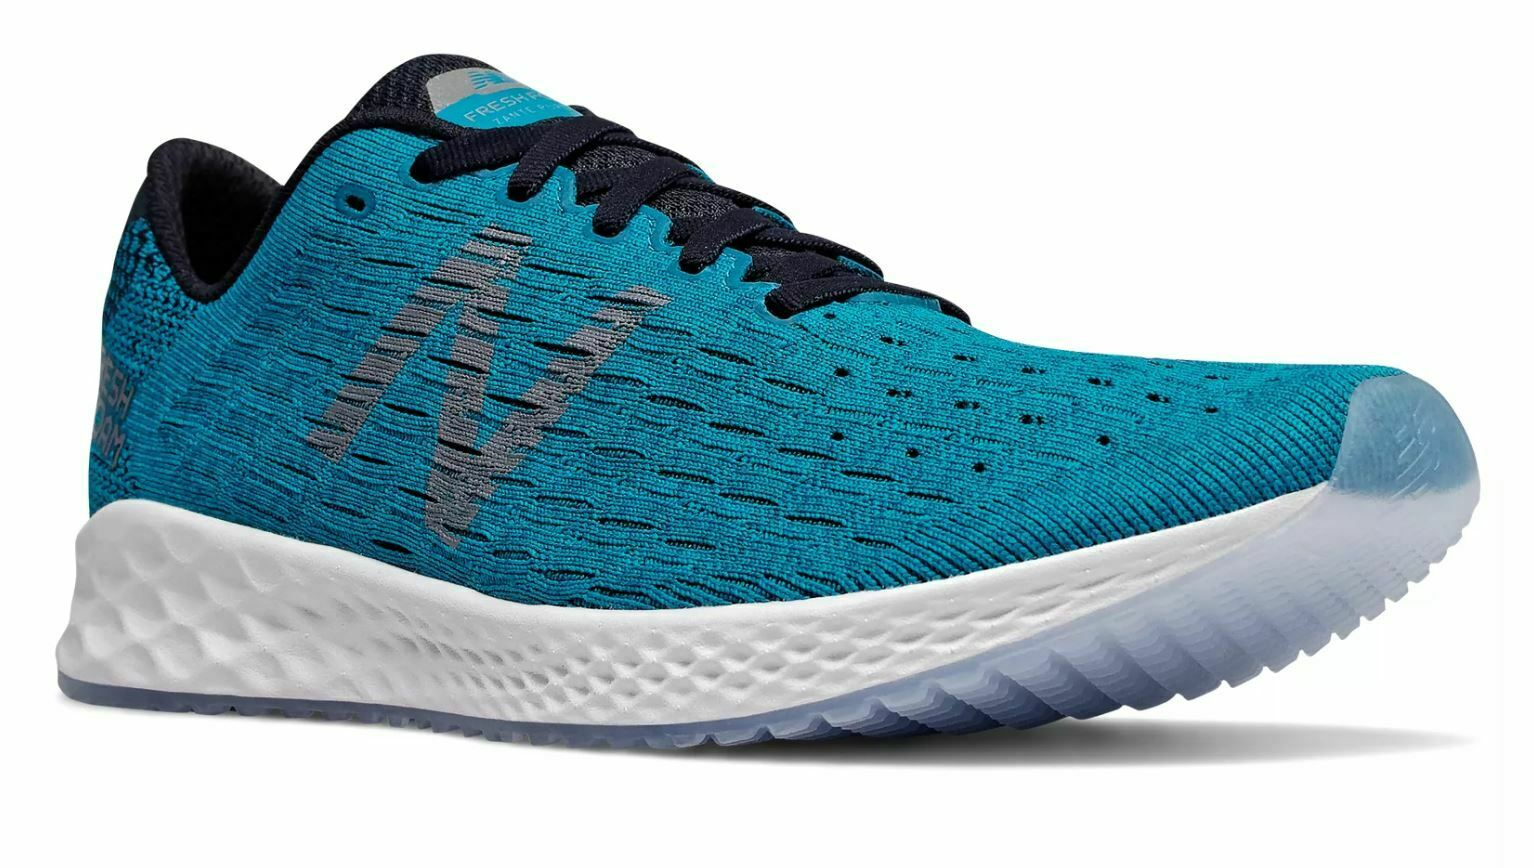 AUTHENTIC    New Balance Zante Pursuit Mens Running shoes (D) (MZANPDO)